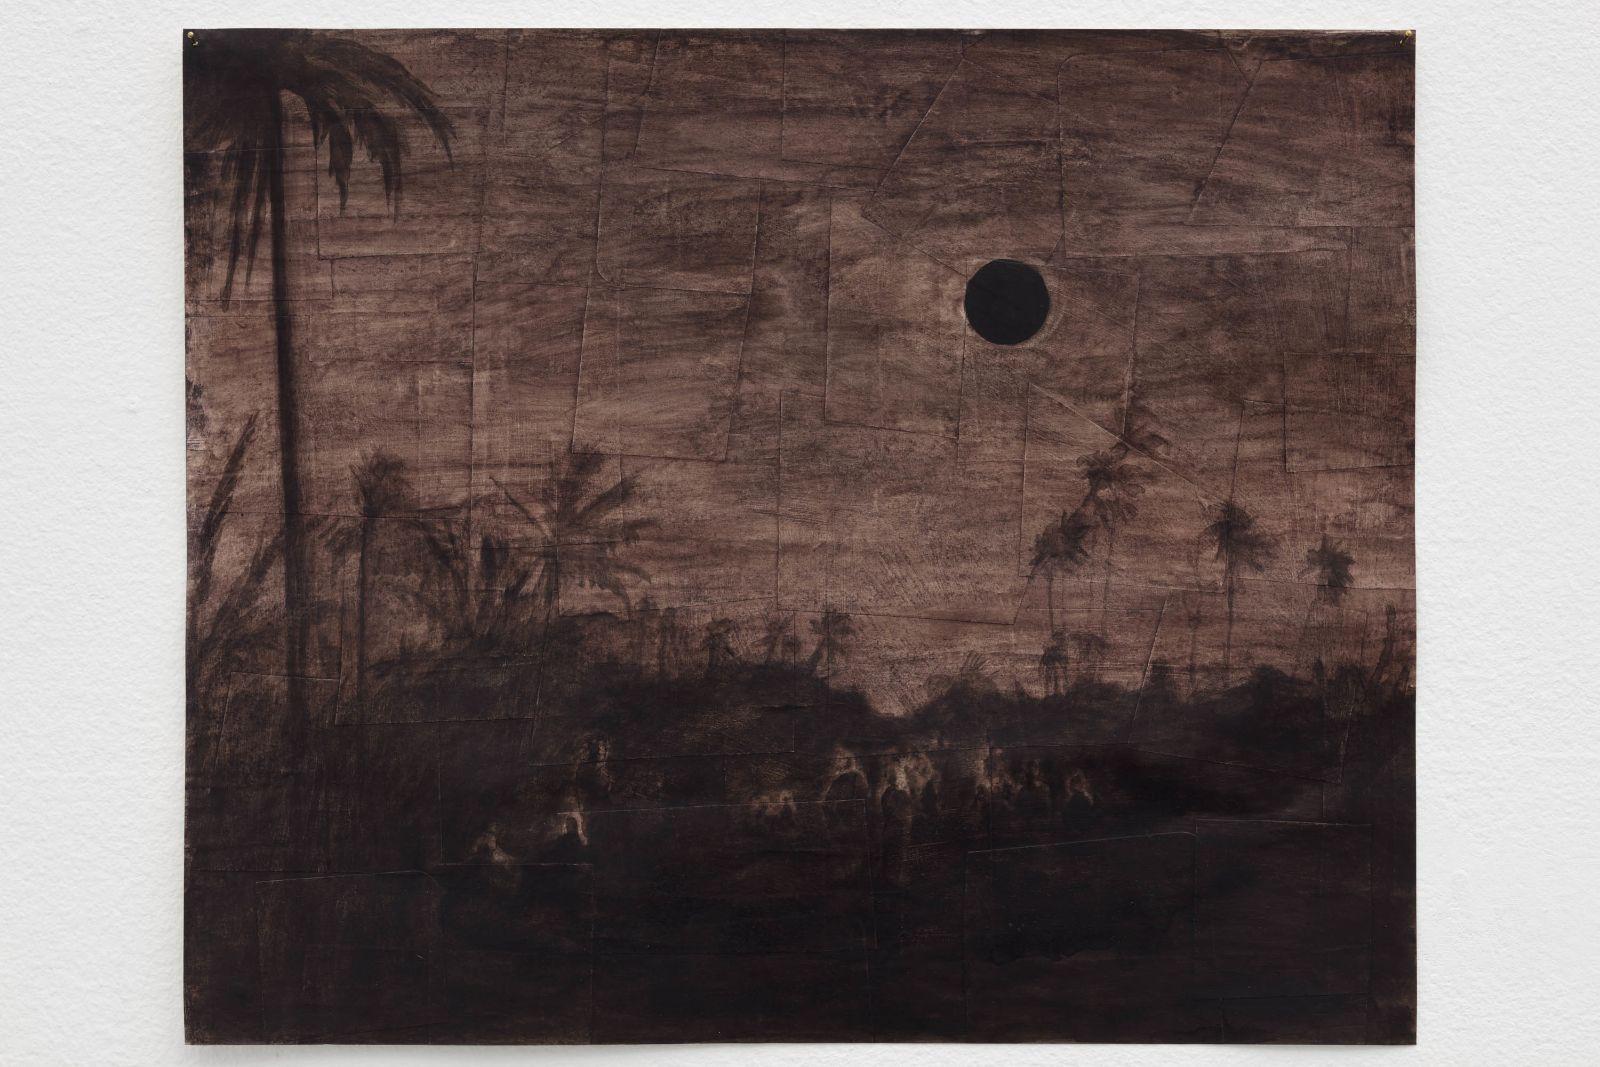 Guntur II, 2016, acrylic and ink on paper, 37,5 x 45 cm